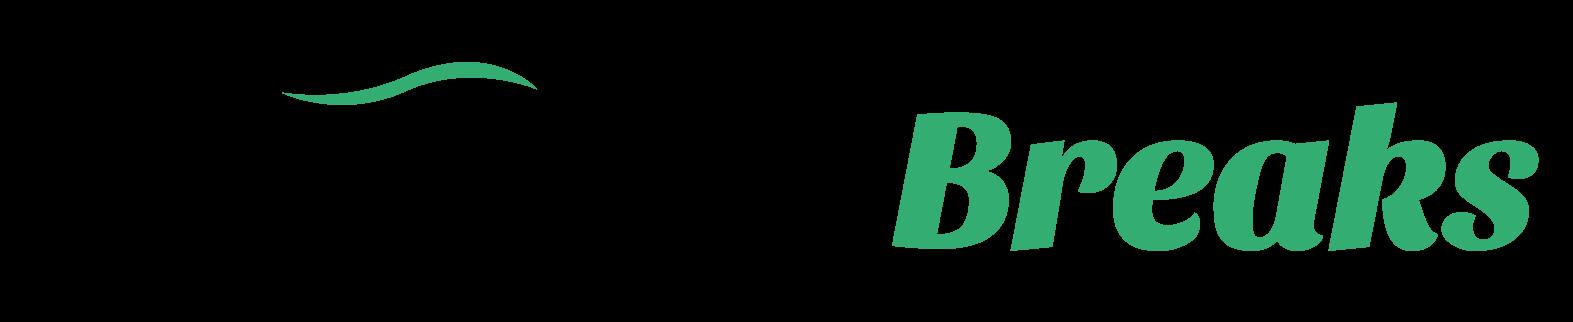 rb-logo-rgb-black-green-strapline (2) (4)